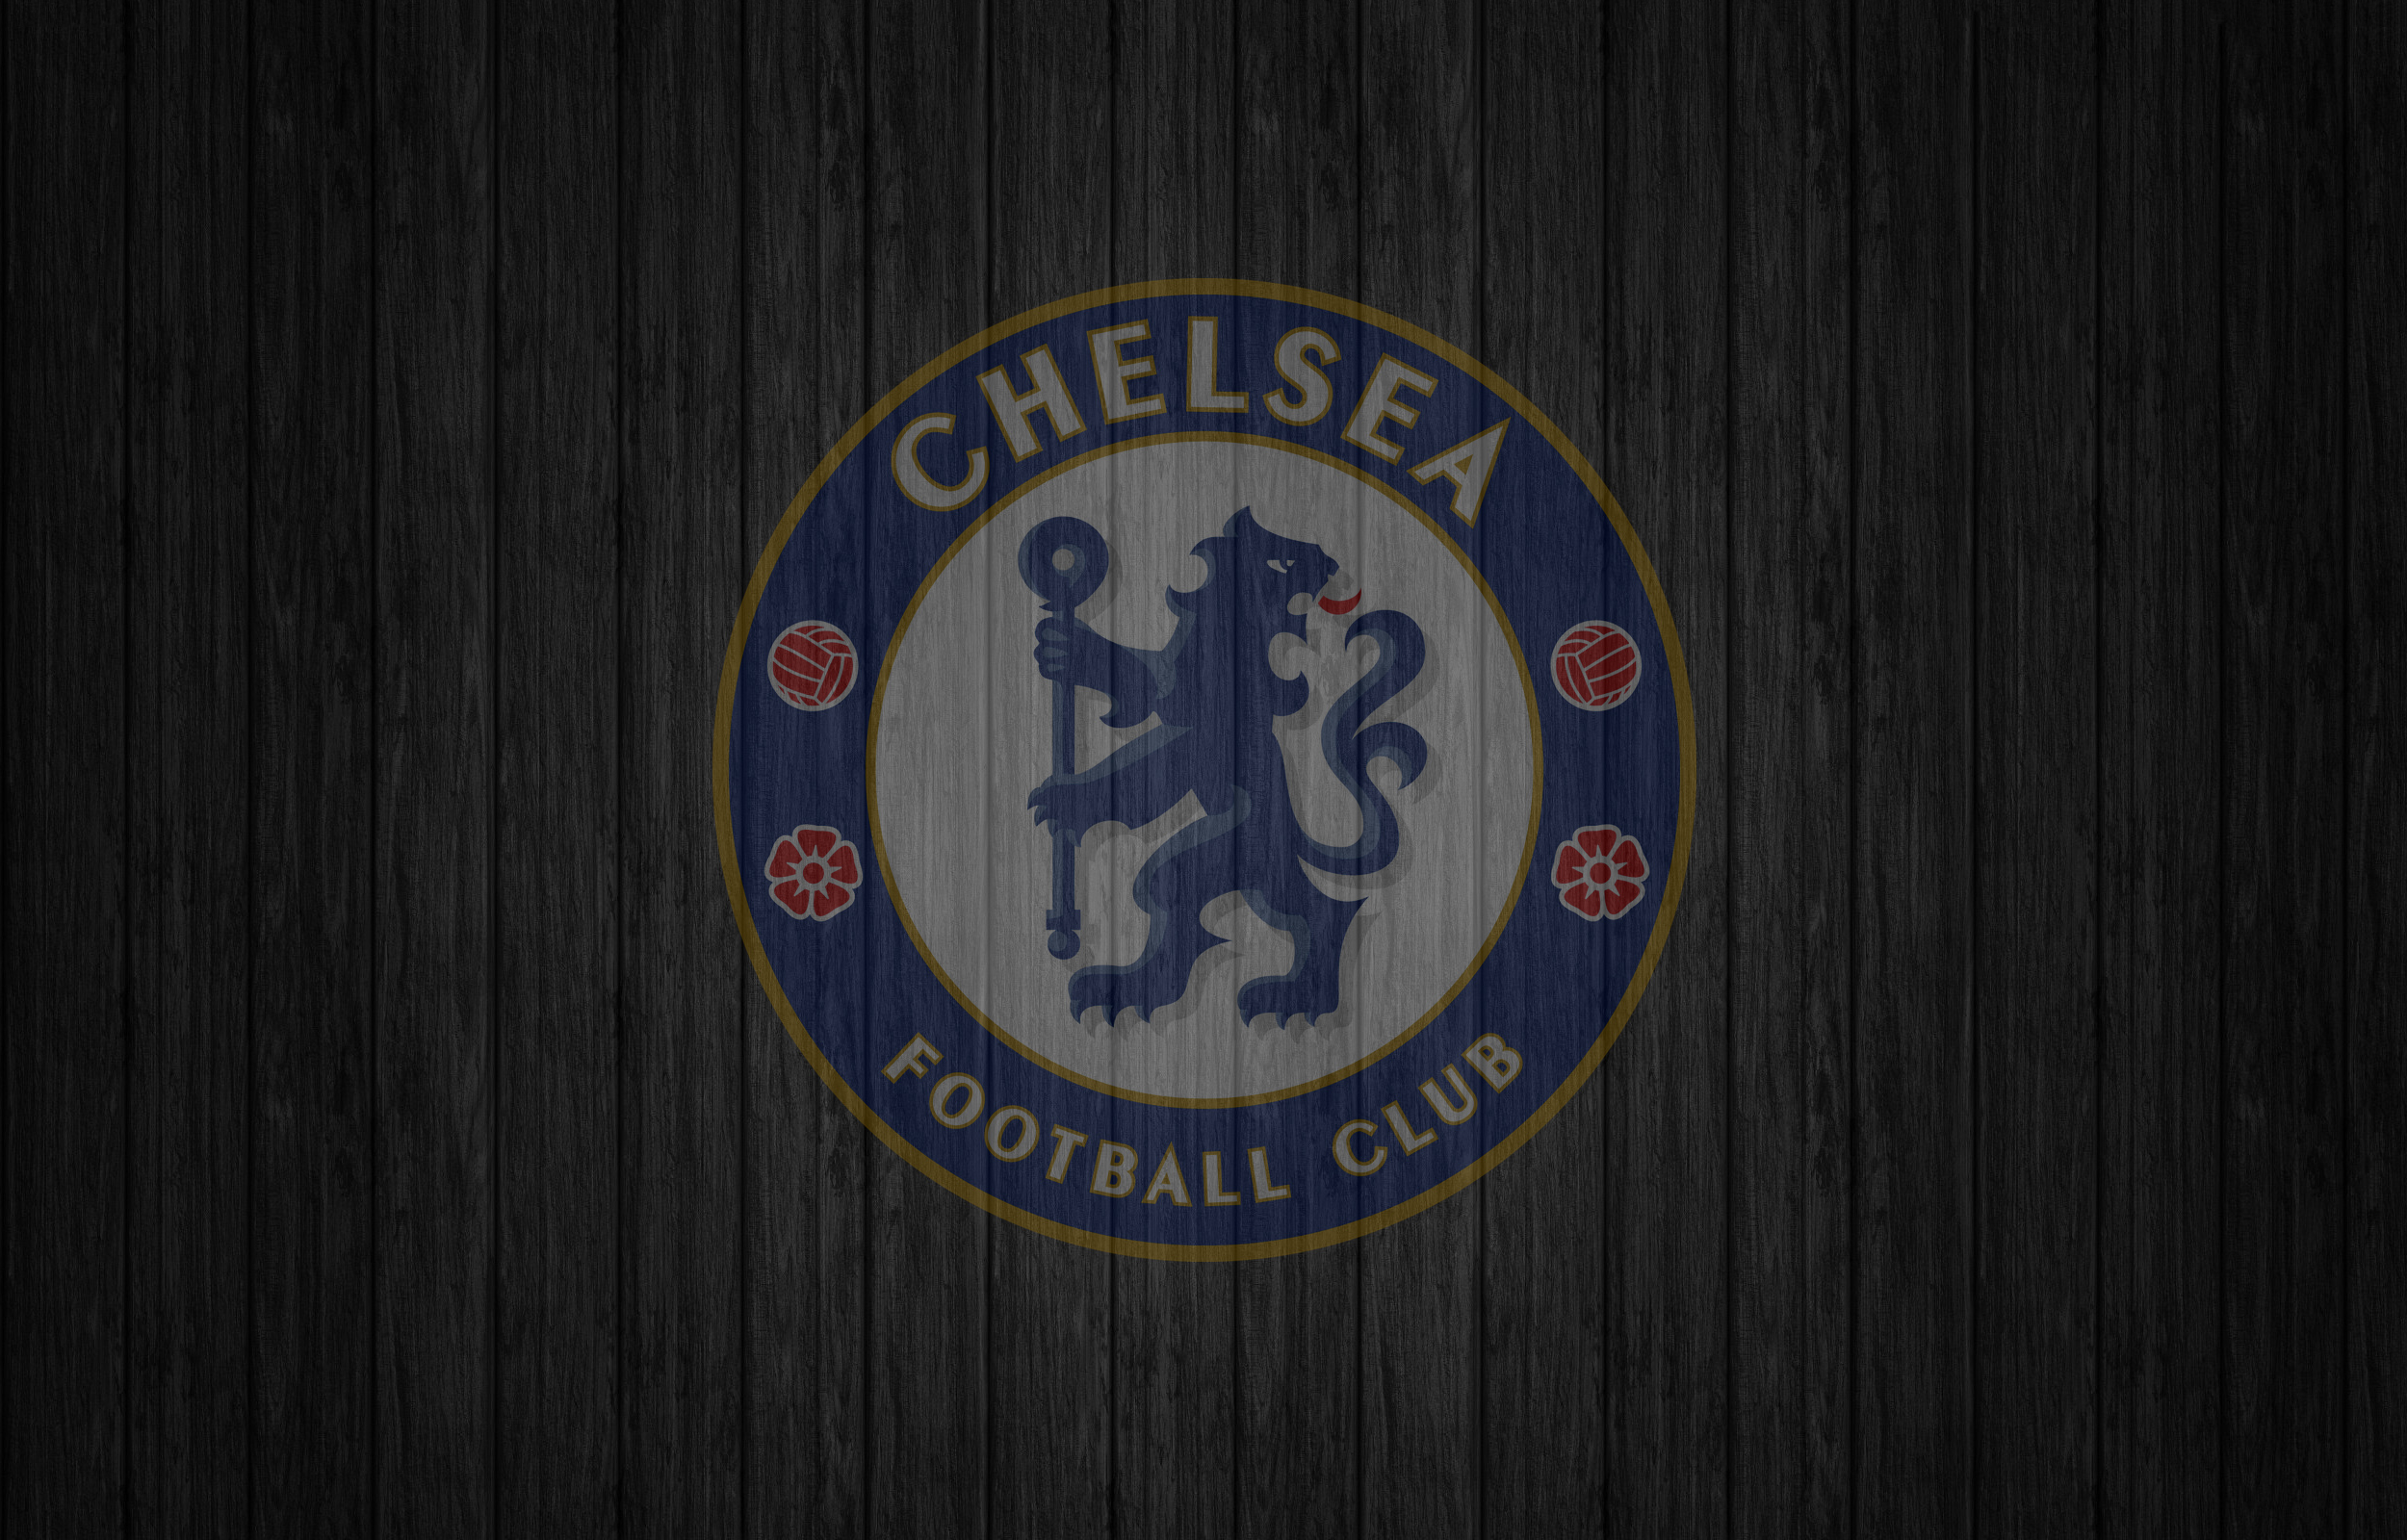 Chelsea fc logo hd sports 4k wallpapers images - Chelsea wallpaper 4k ...